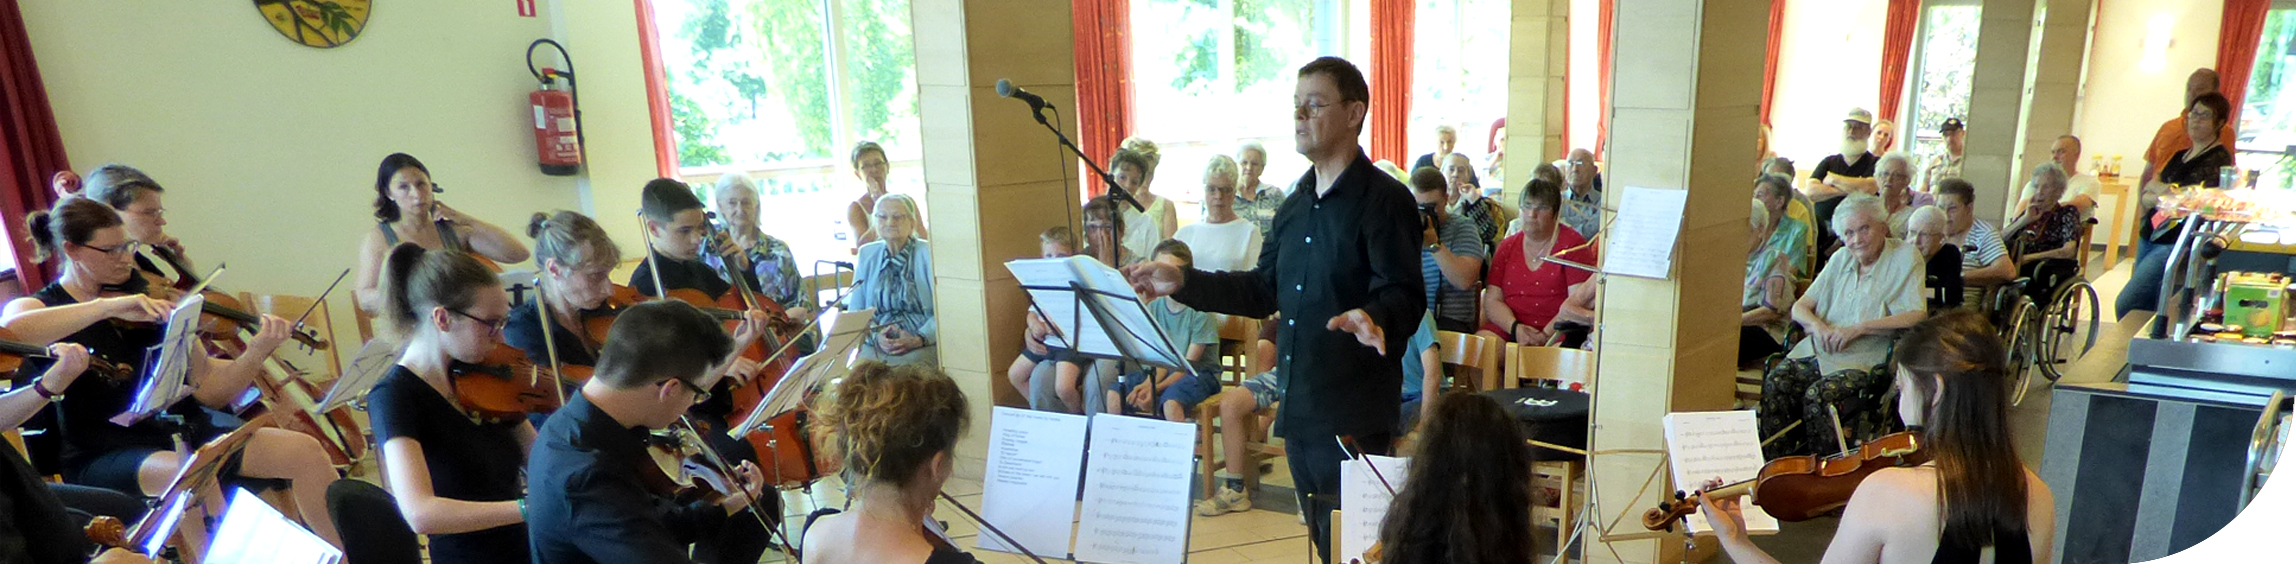 "Concert de l'orchestre "" Tremolo """